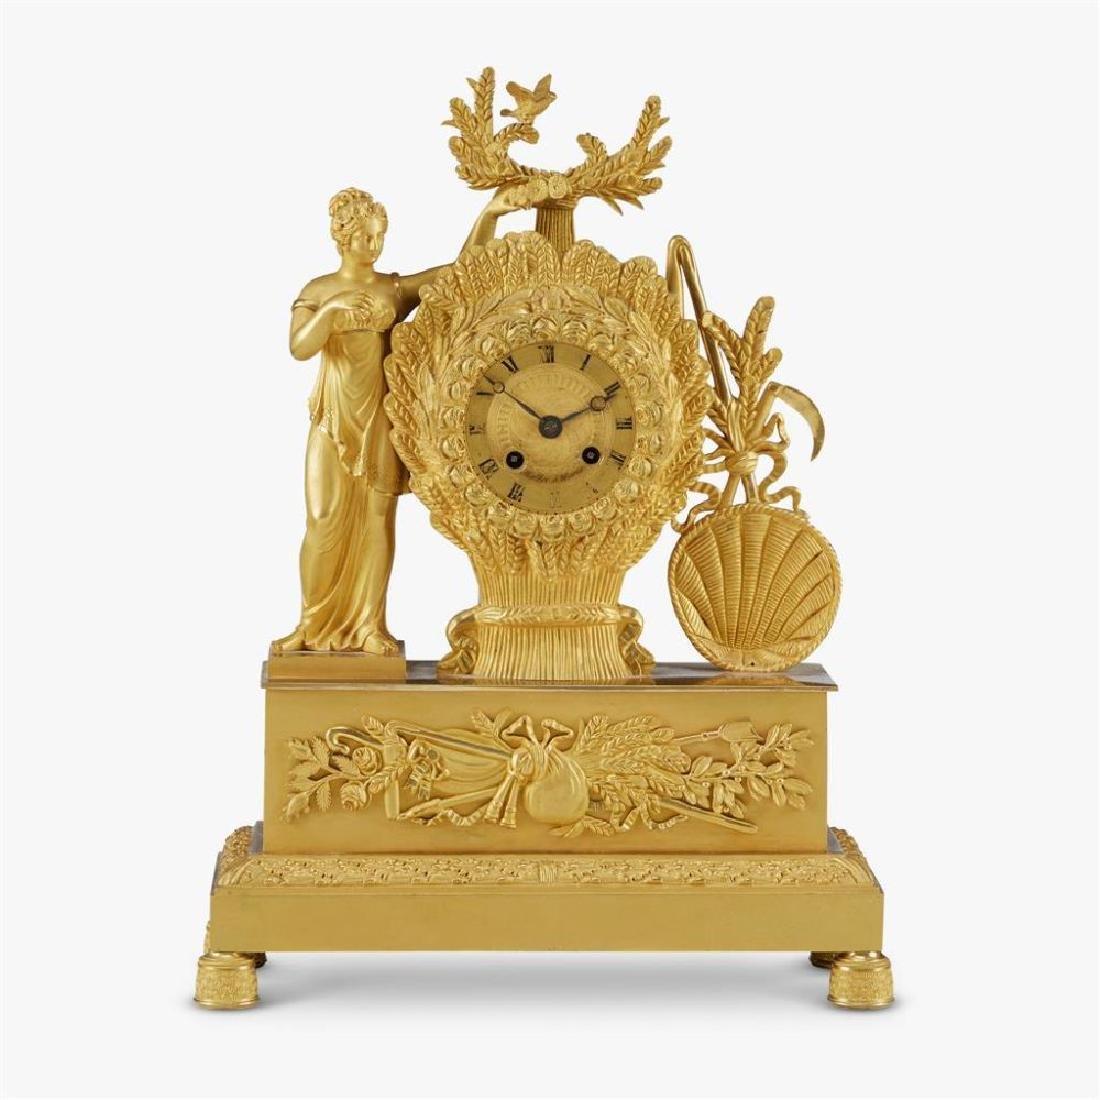 19Th C. Louis Philippe Ormolu Figural Mantel Clock